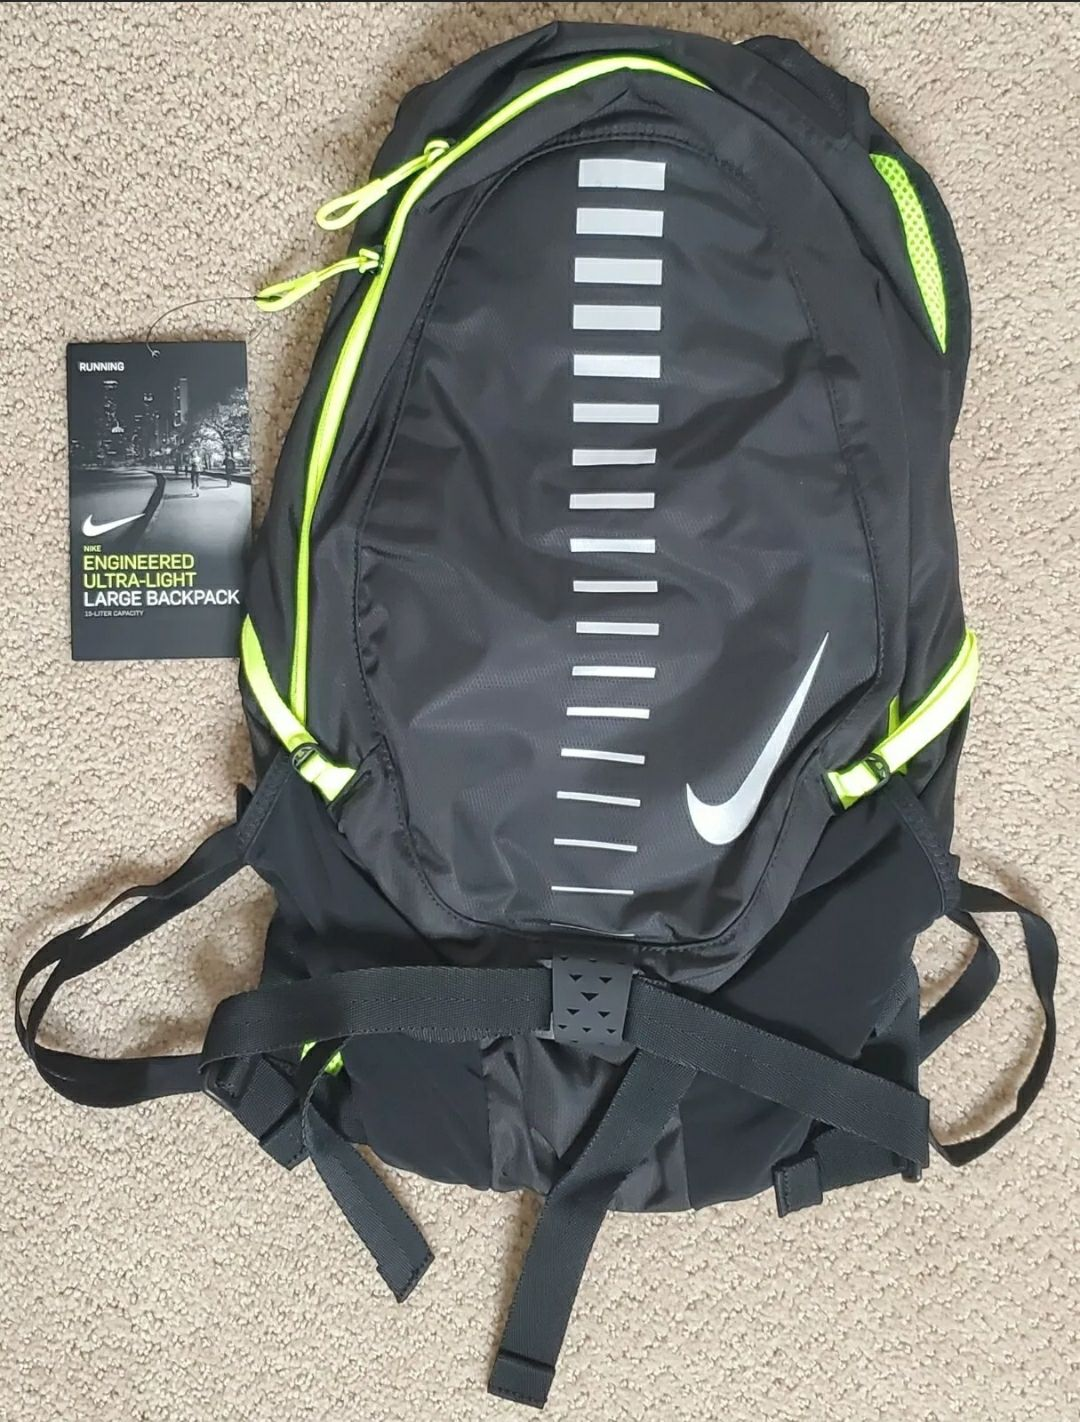 Nike Engineered Ultra-Light Backpack